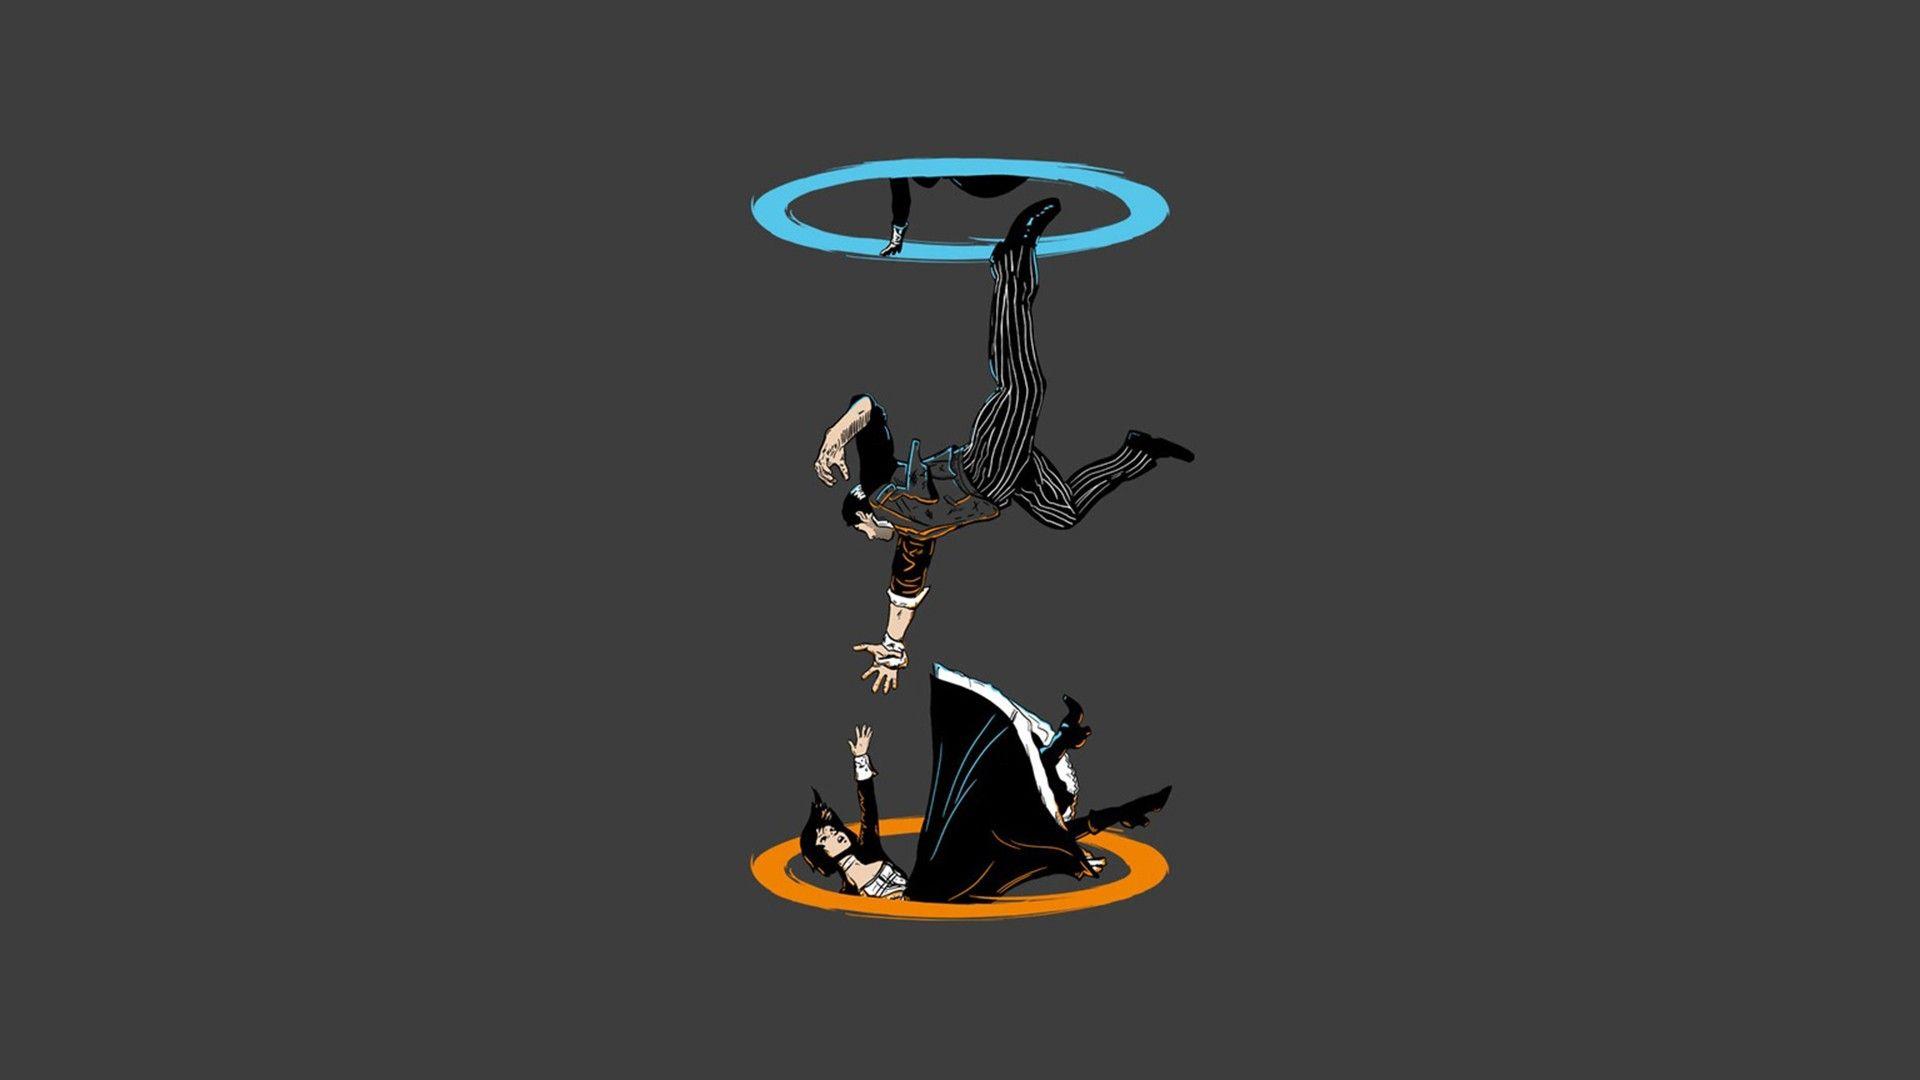 Bioshock Infinite By Acersense On Deviantart Bioshock Portal Wallpaper Skyrim Wallpaper